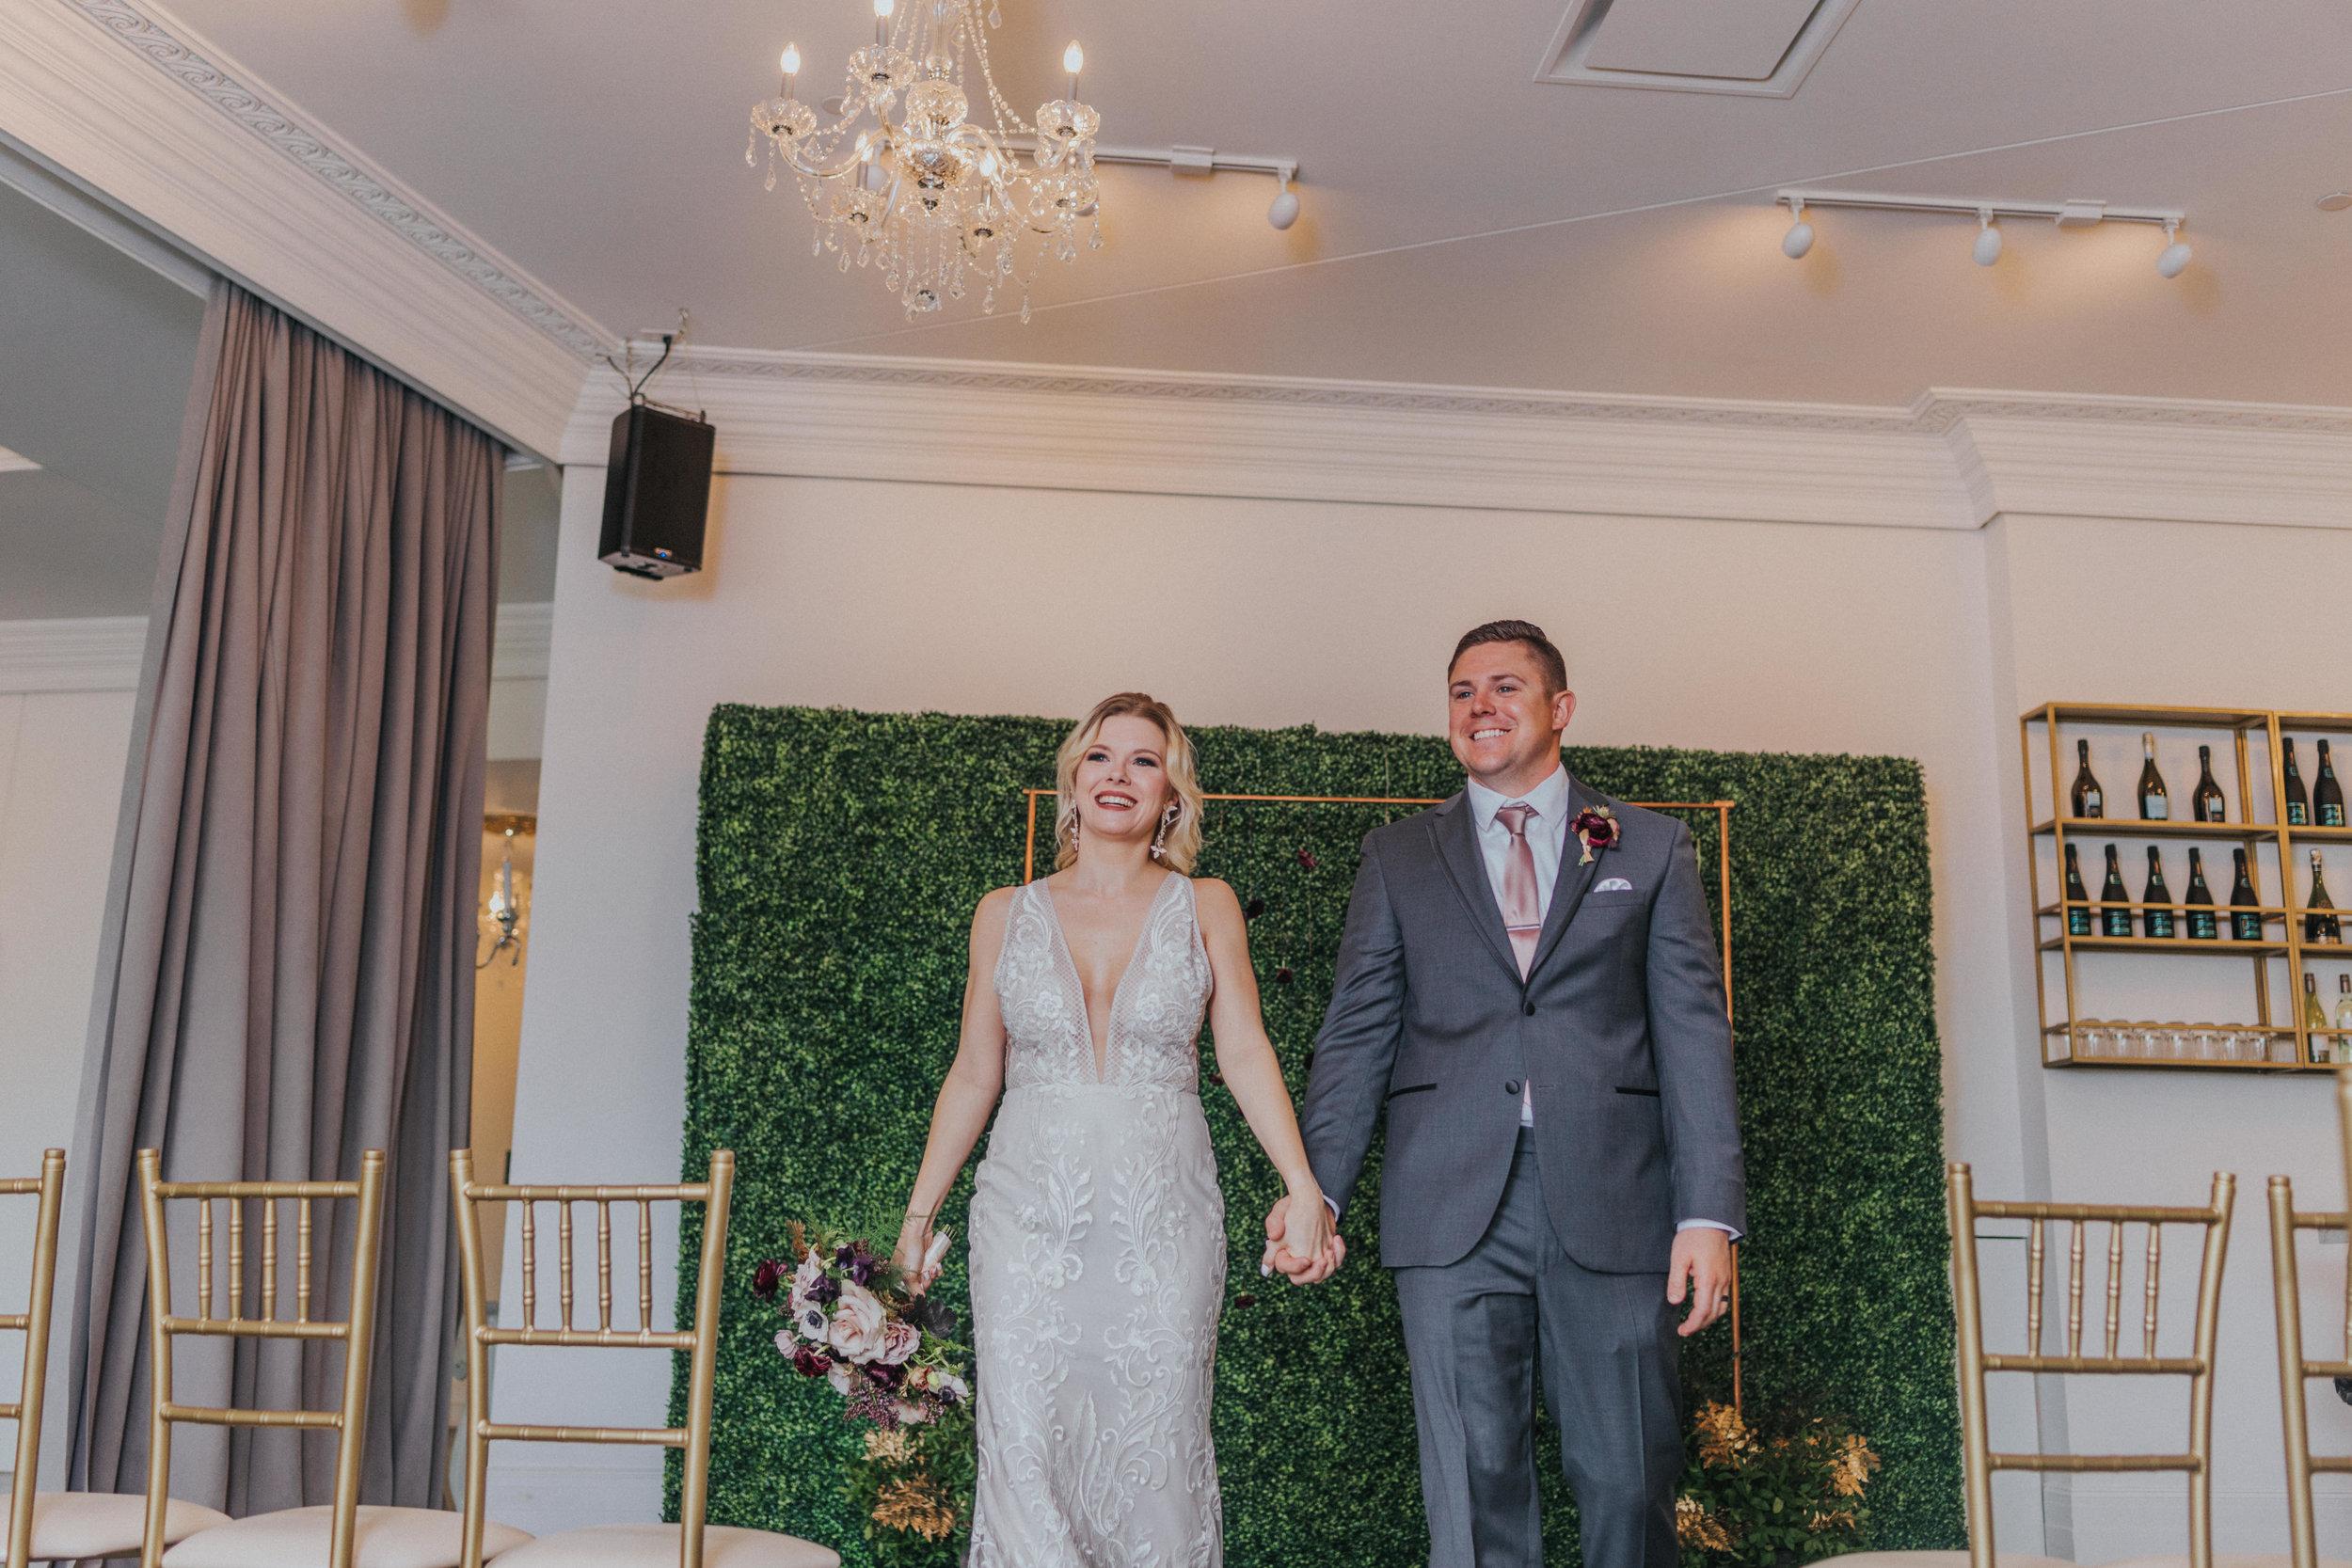 127 tiny-luxe-weddings-omaha-nebraska-midwest-empire-room.jpg